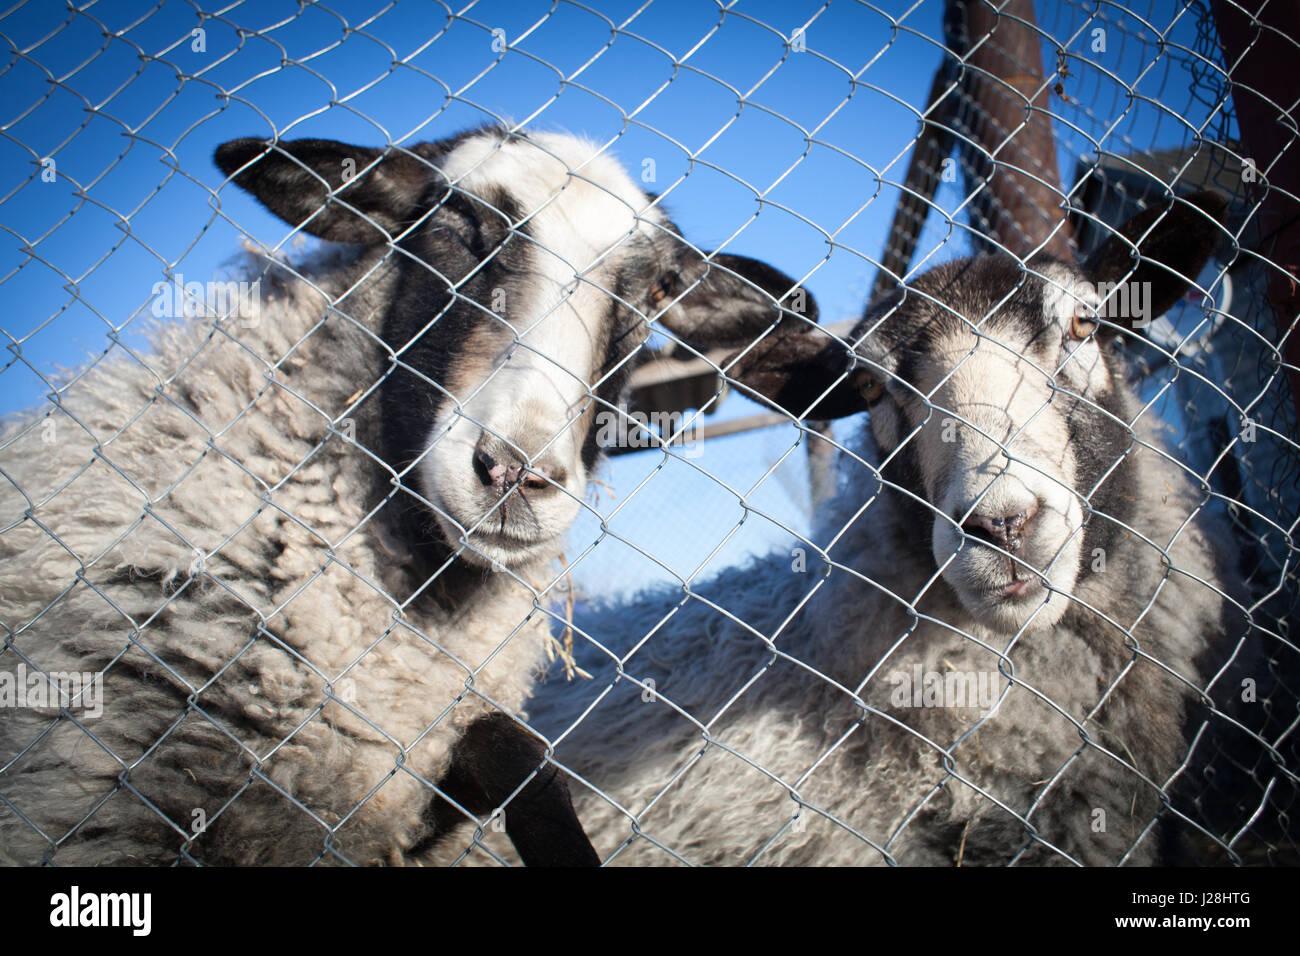 Australia Paddock Sheep Stock Photos & Australia Paddock